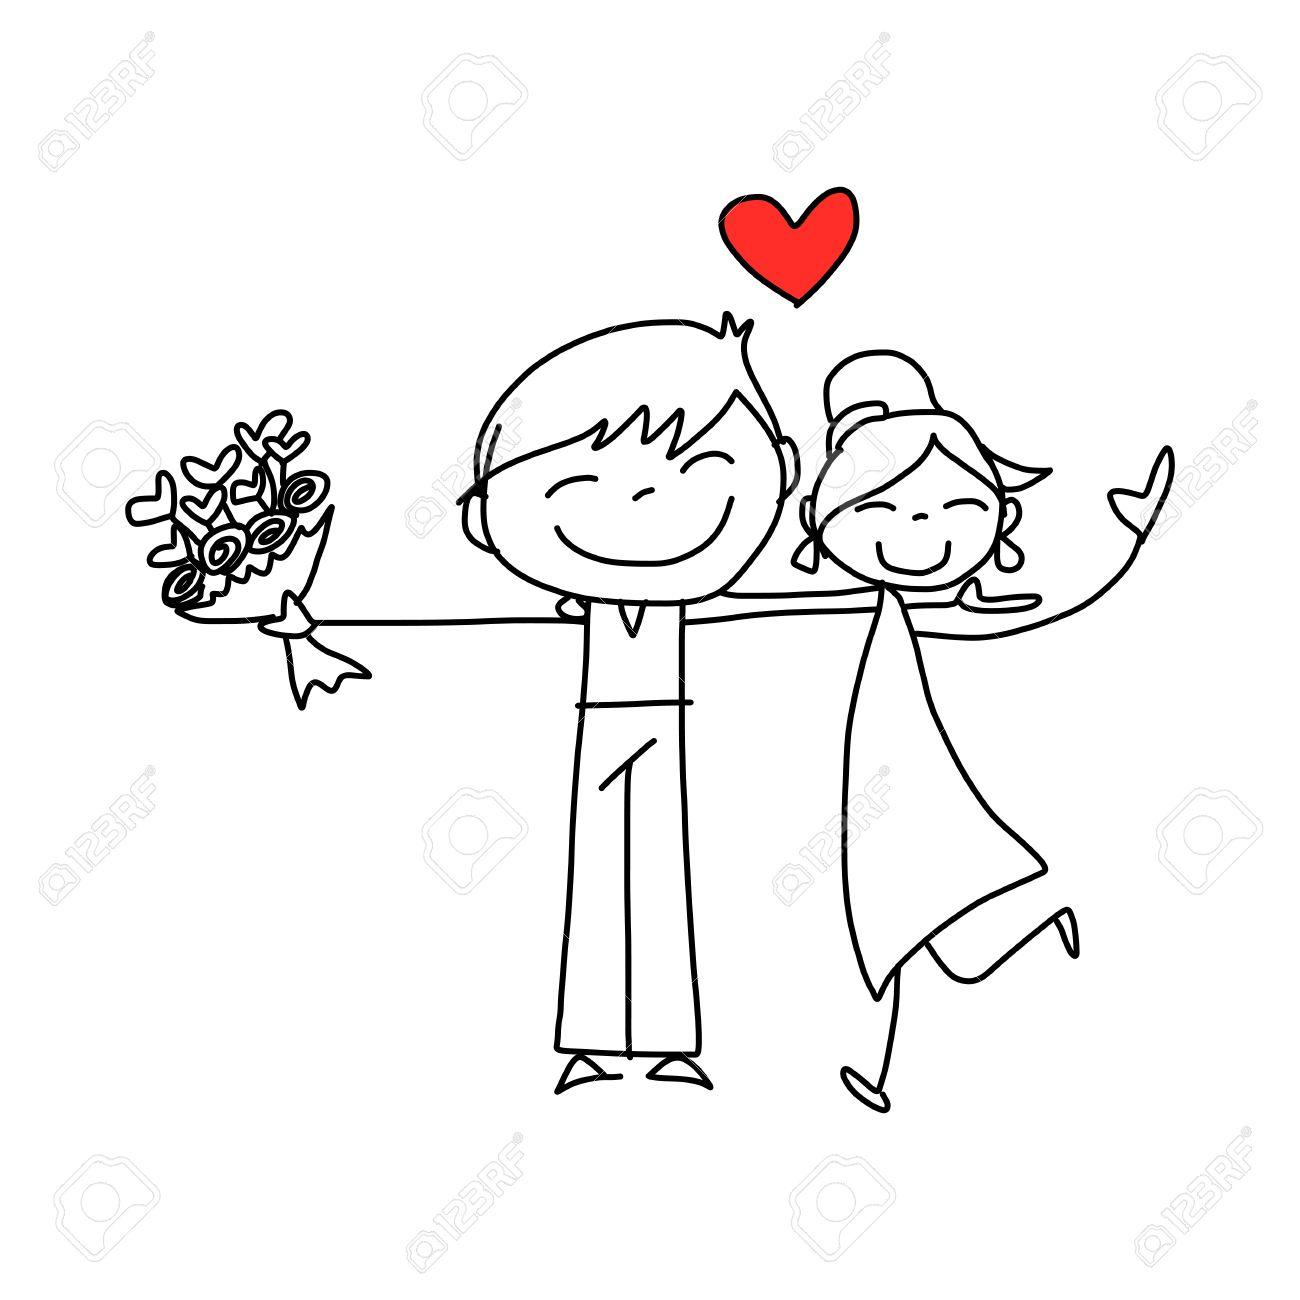 hand drawing cartoon character happy lovers wedding - 22719034